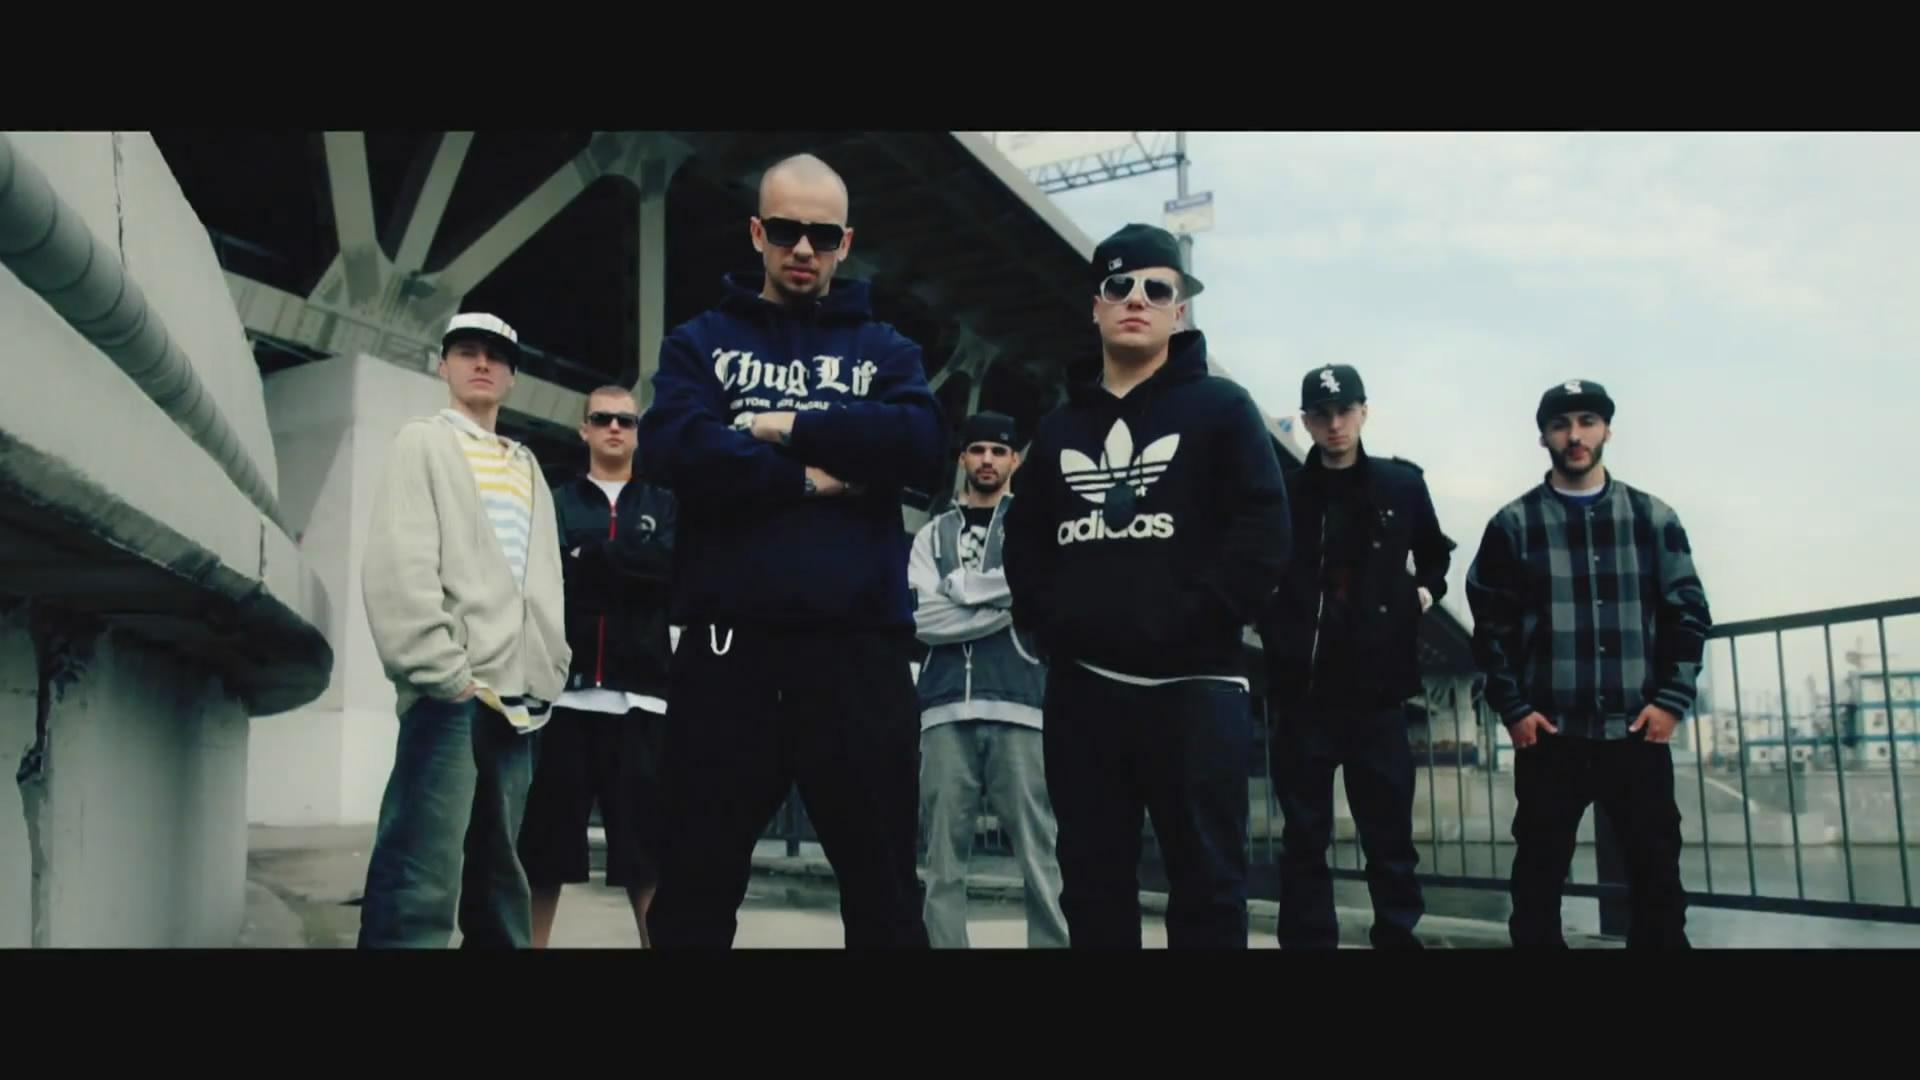 ST и DJ Maxxx - Скажи мне, кто (2010)